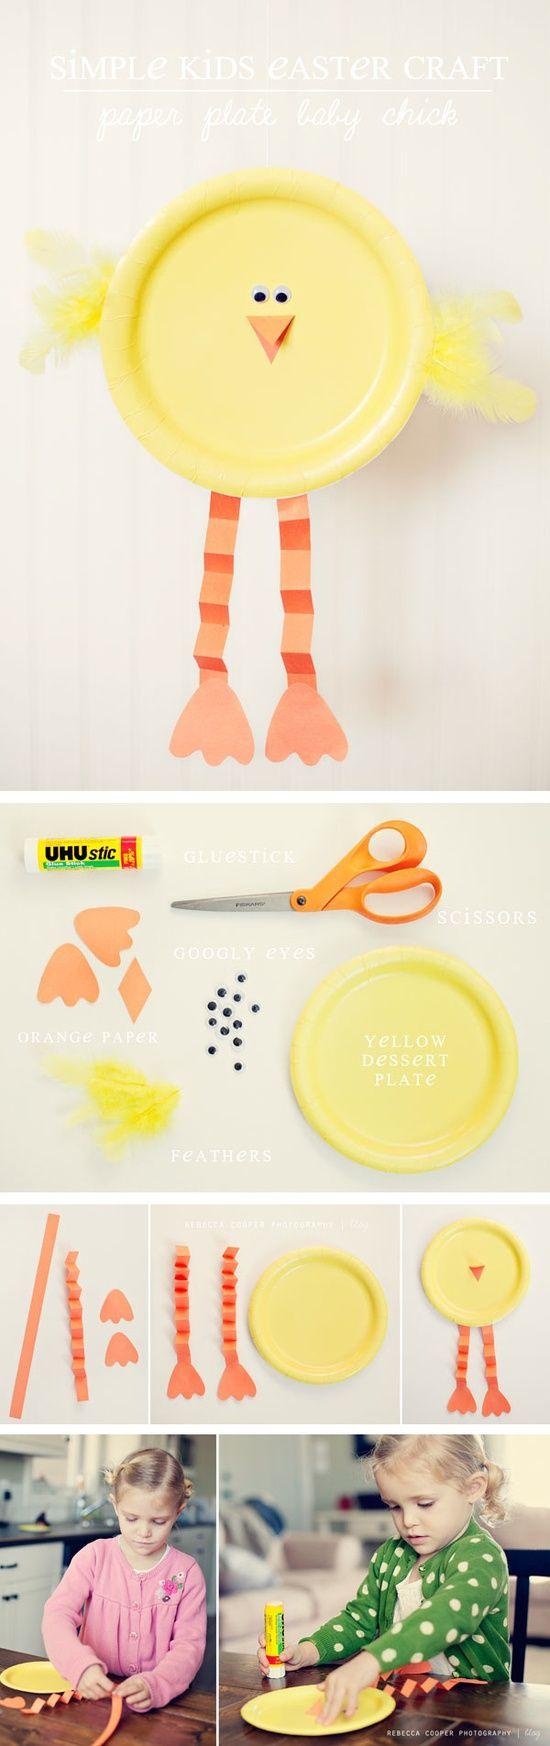 Chick plate craft